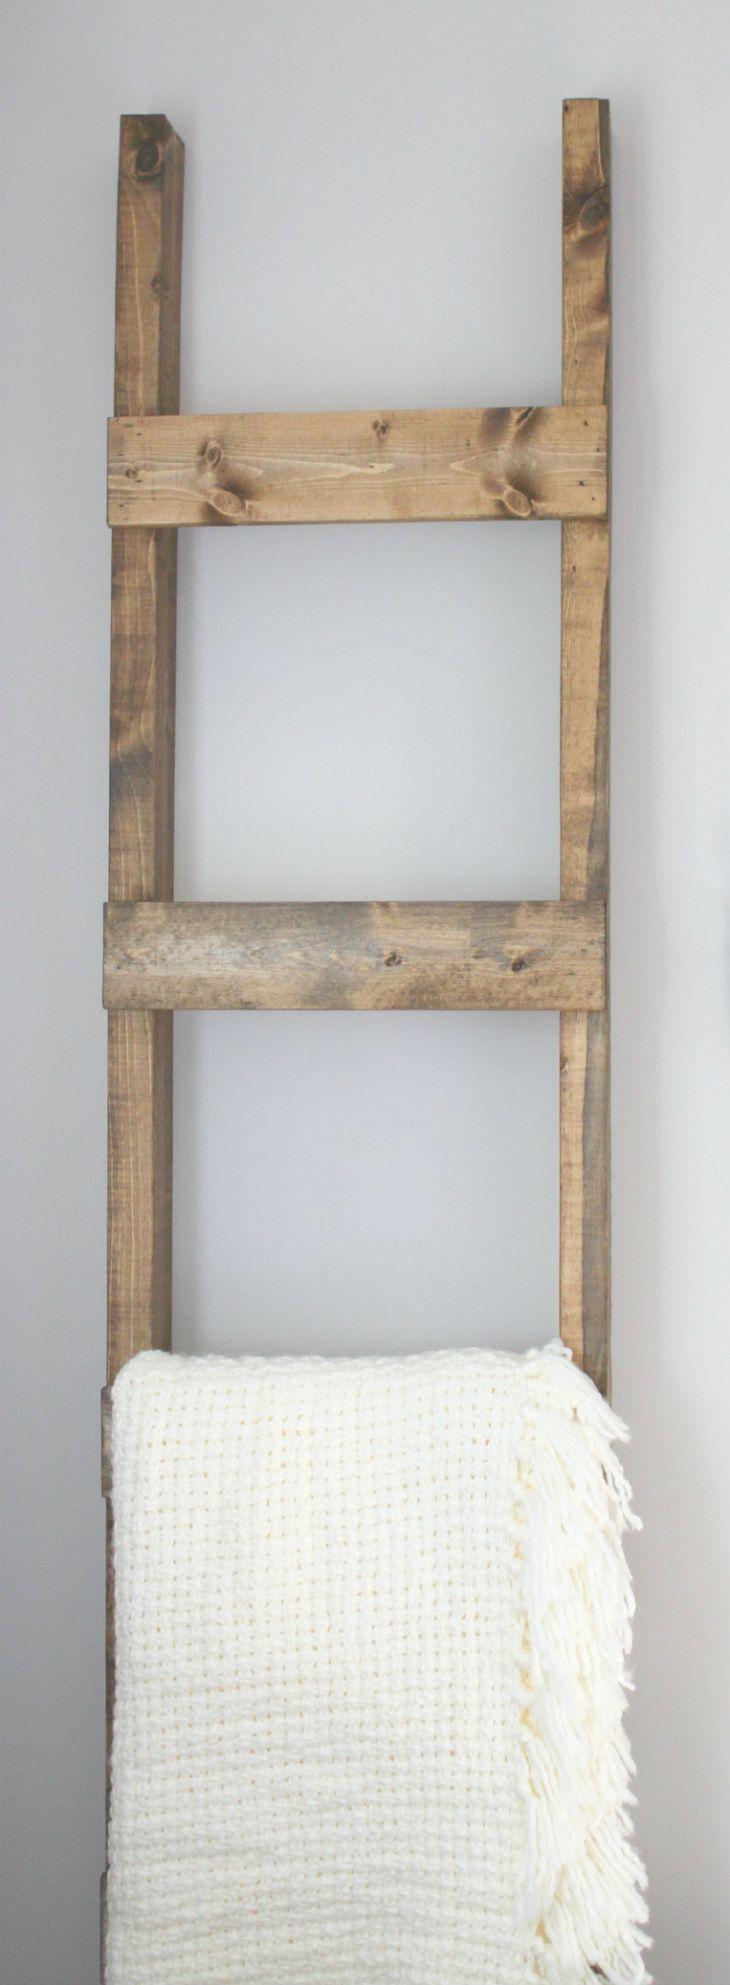 Diy Blanket Ladder Best 25 Quilt Ladder Ideas On Pinterest Blanket Rack Blanket